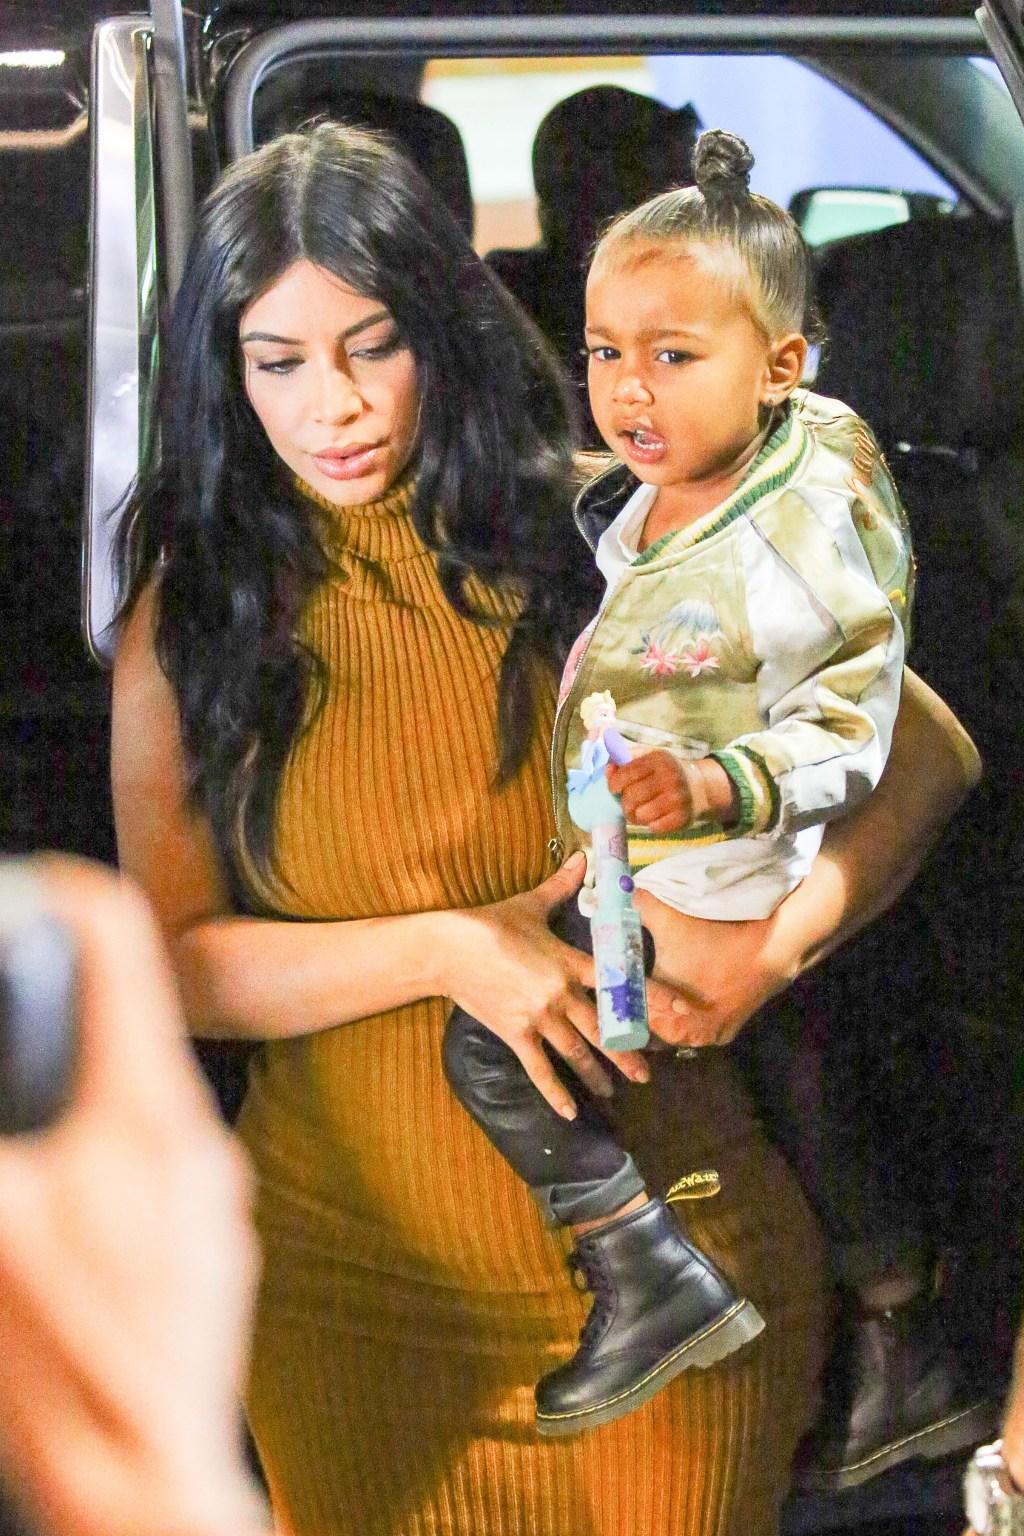 Pregnant Kim Kardashian & Daughter North West Take NYC